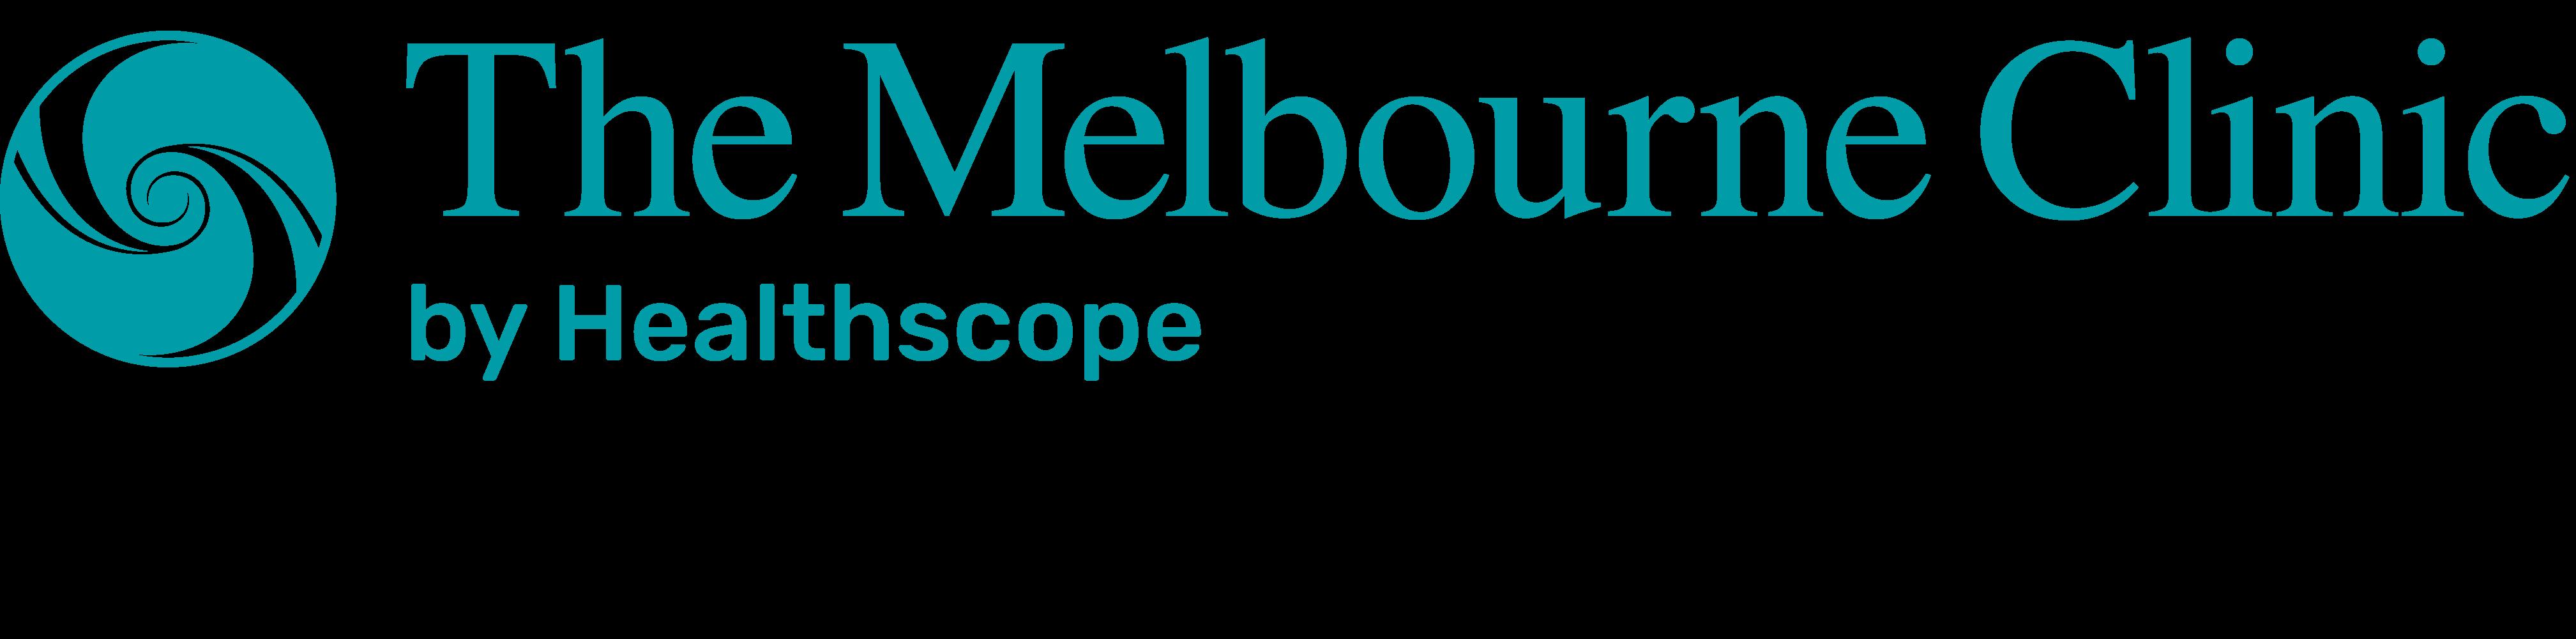 The Melbourne Clinic logo